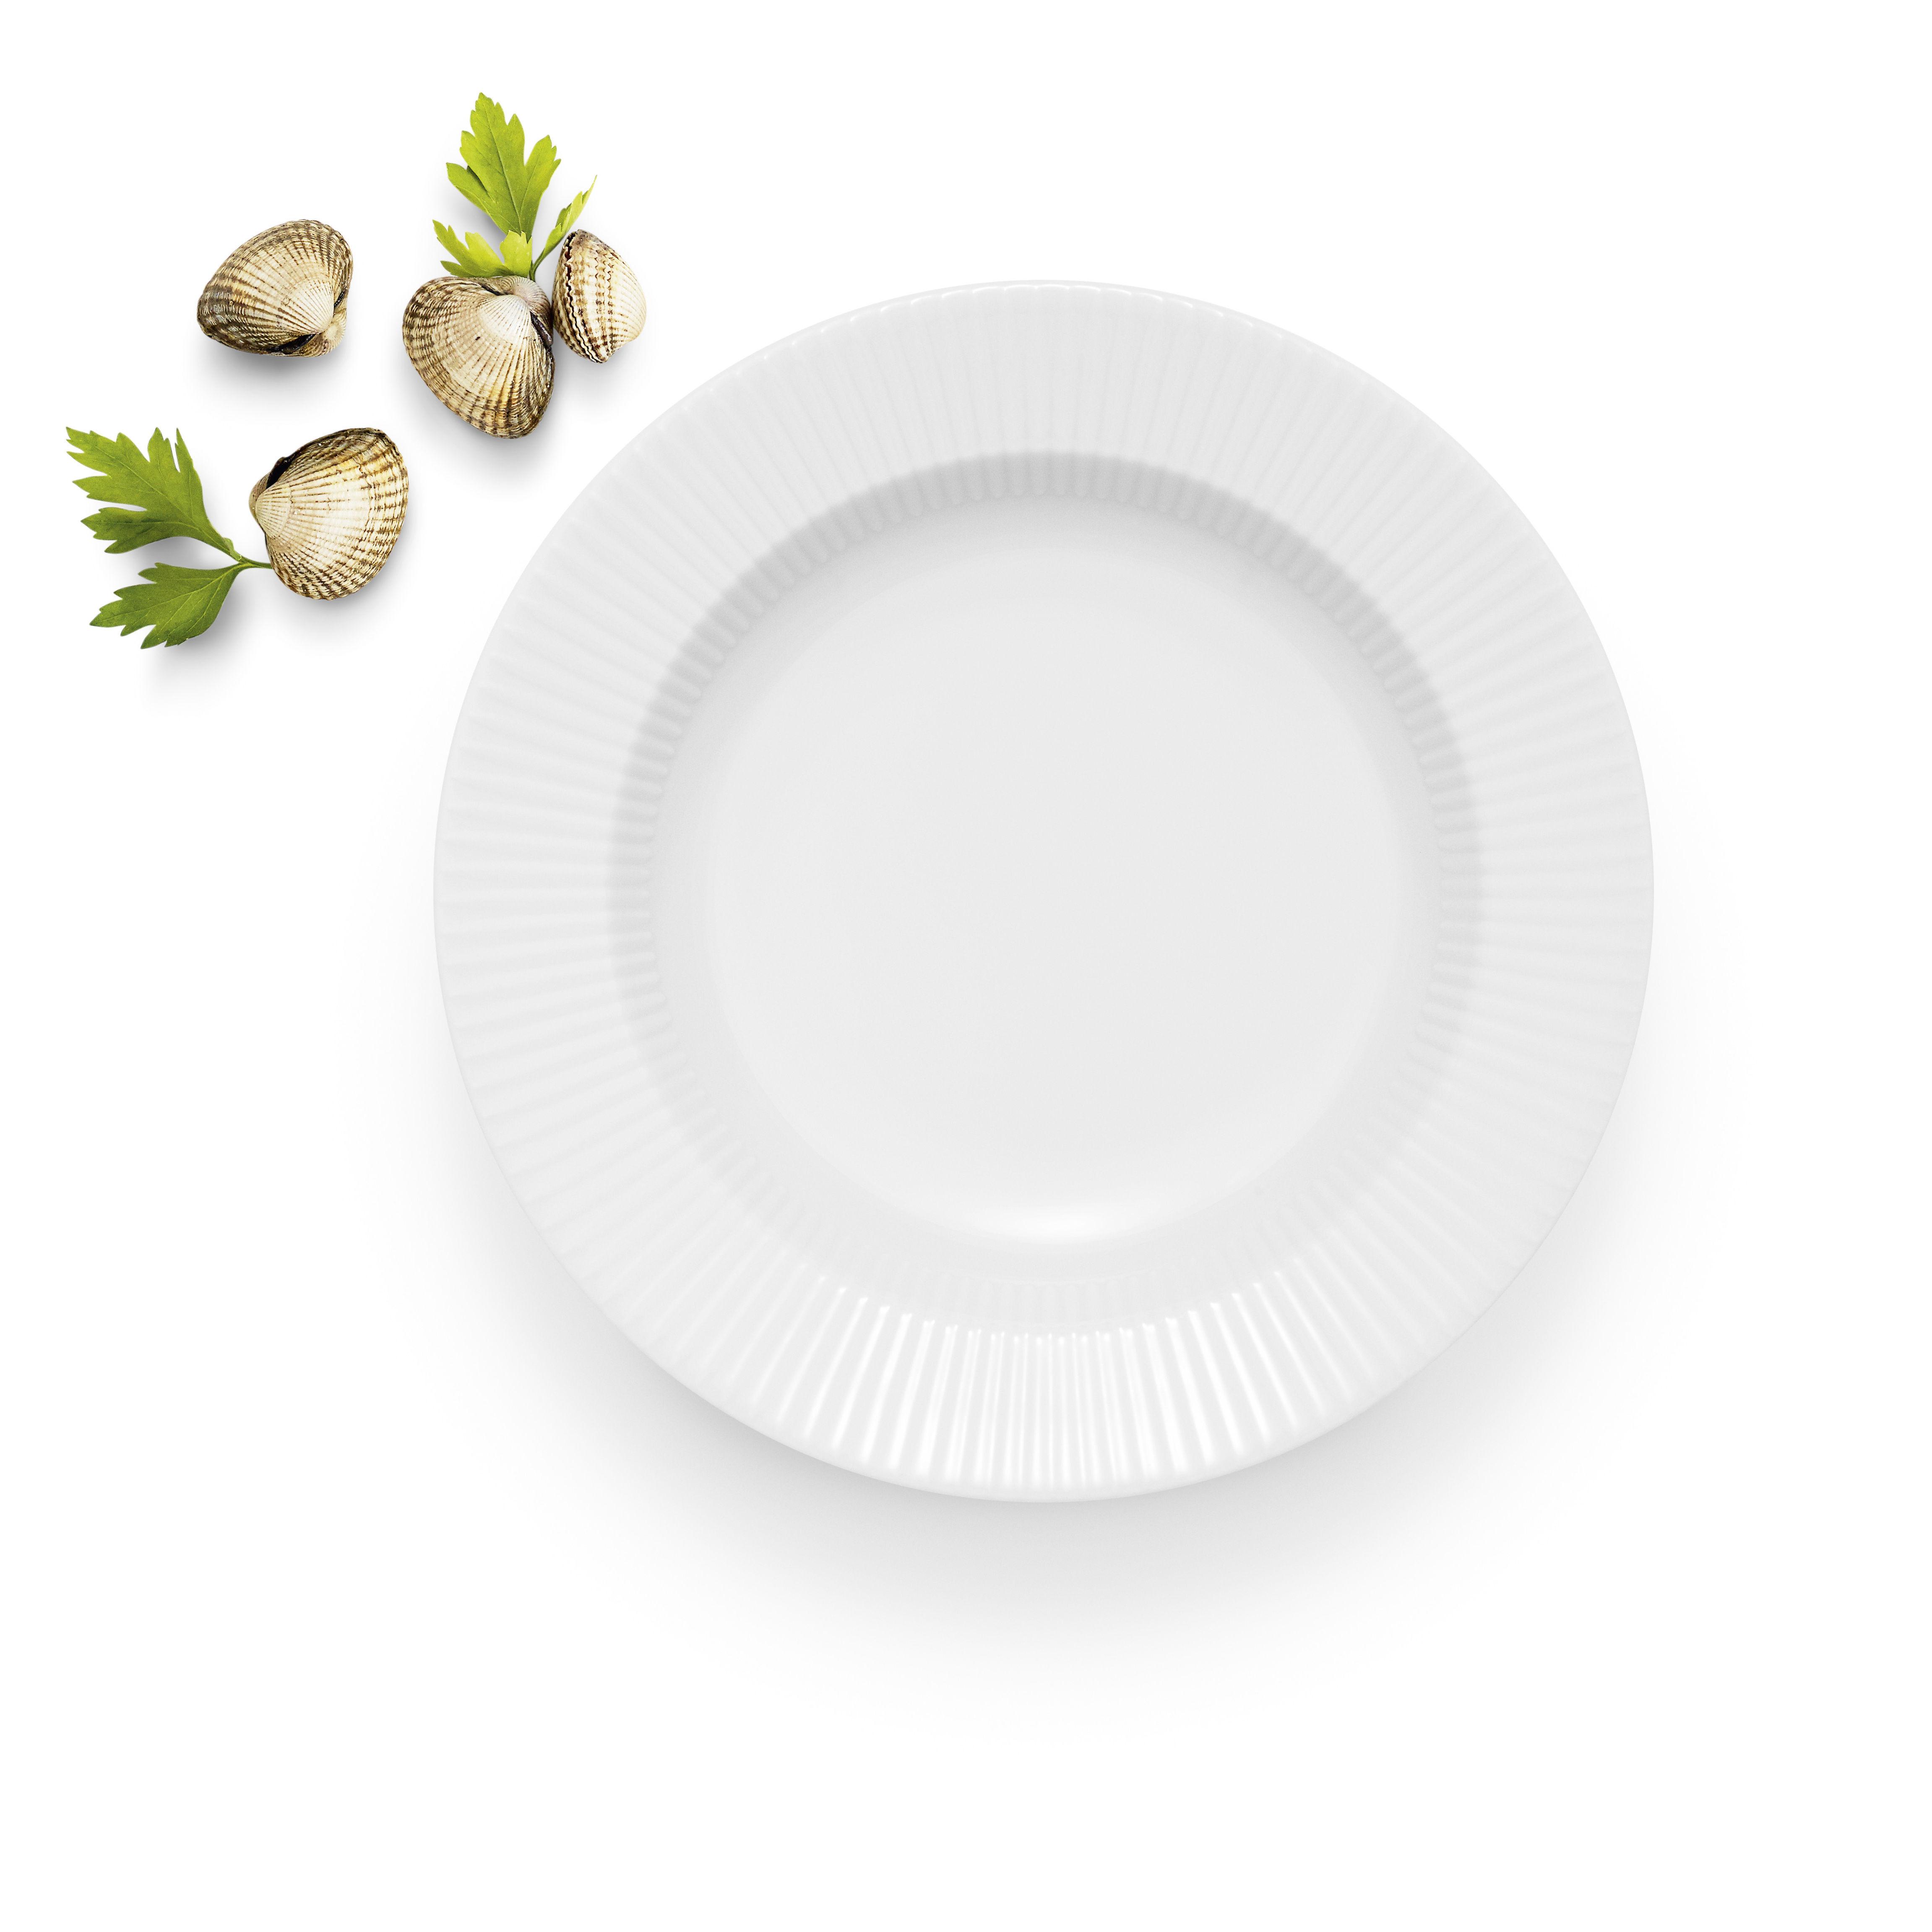 assiette creuse legio nova 25 cm blanc eva trio. Black Bedroom Furniture Sets. Home Design Ideas